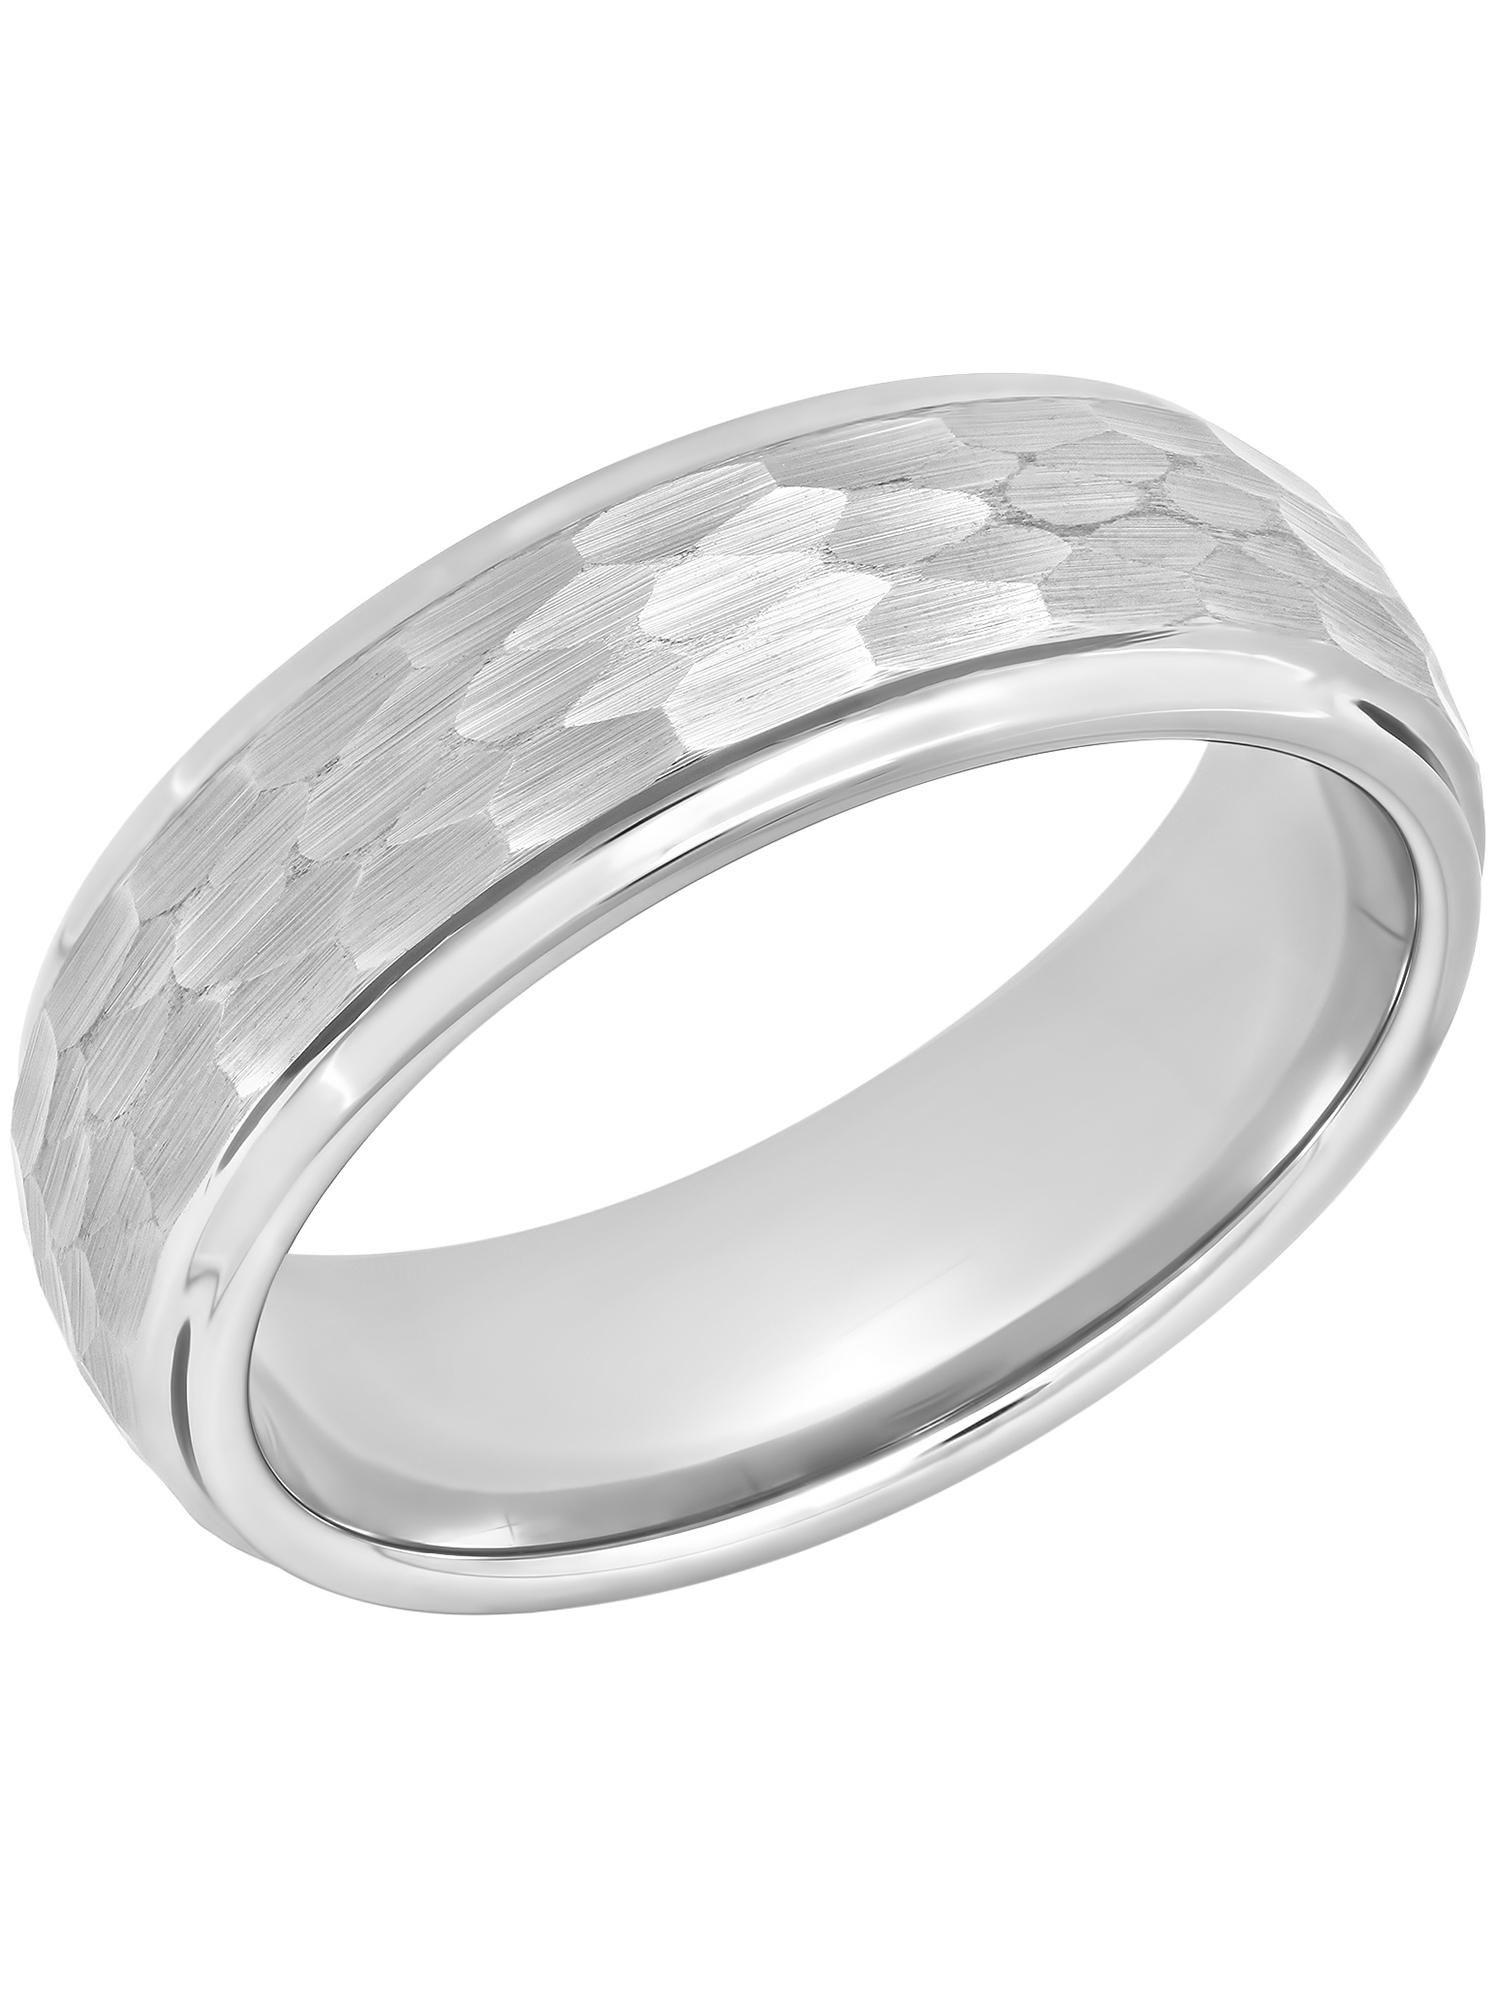 Men's Tungsten 8MM Hammered Finish Wedding Band - Mens Ring